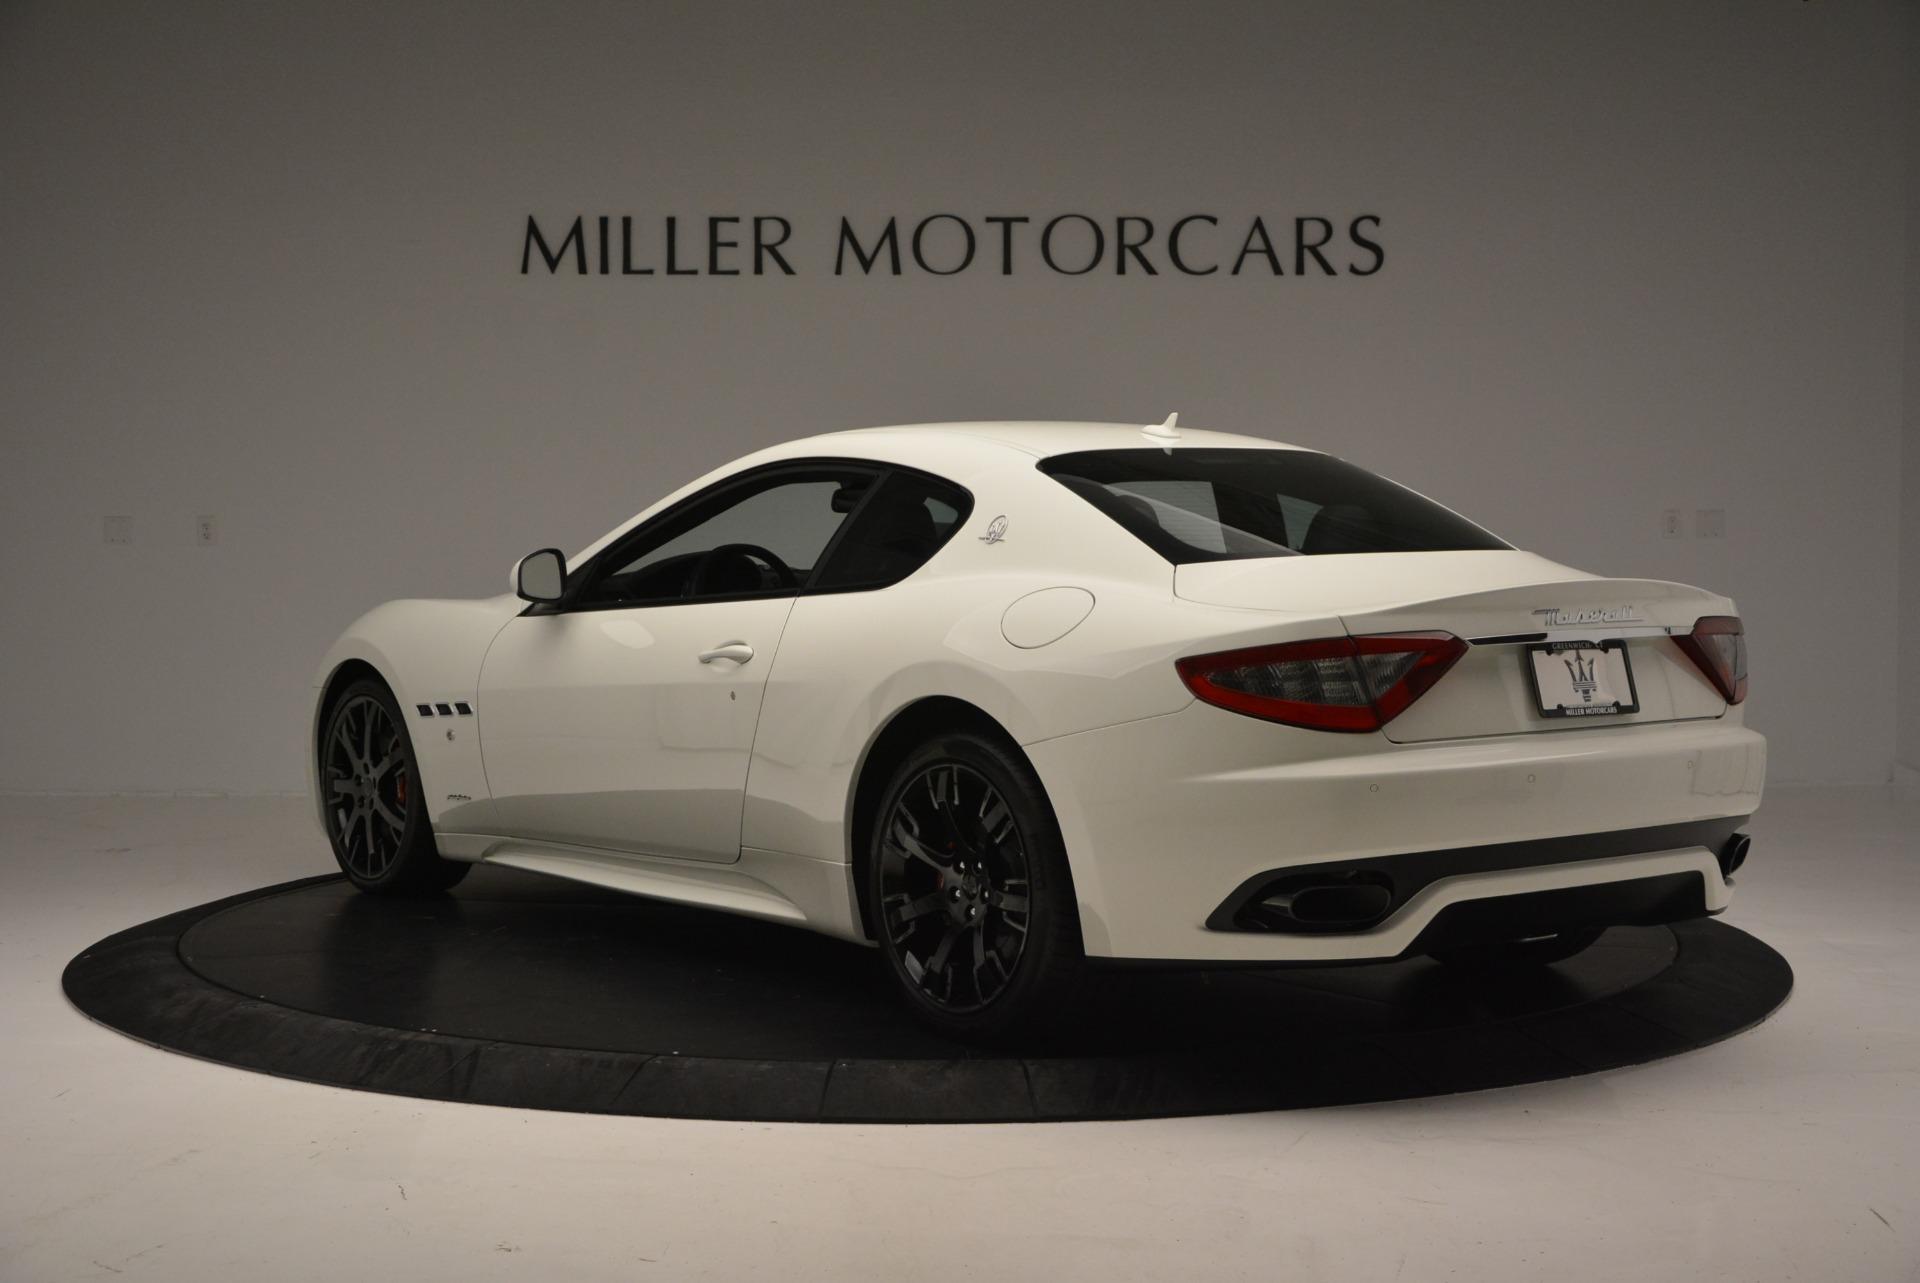 New 2016 Maserati GranTurismo Sport For Sale In Westport, CT 167_p4